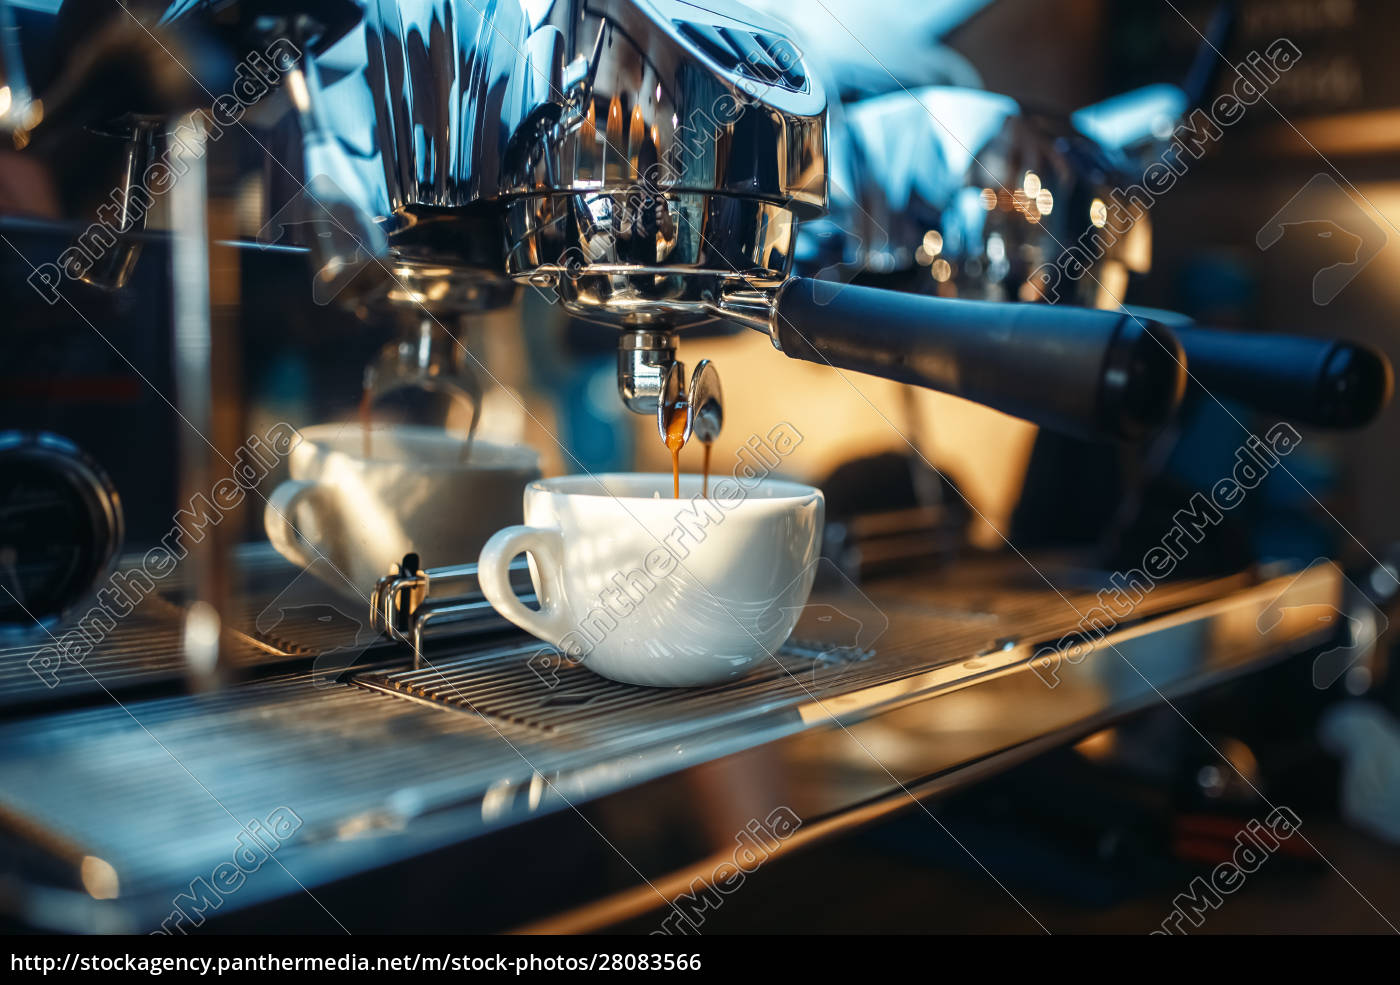 espresso, machine, pours, fresh, black, coffee - 28083566